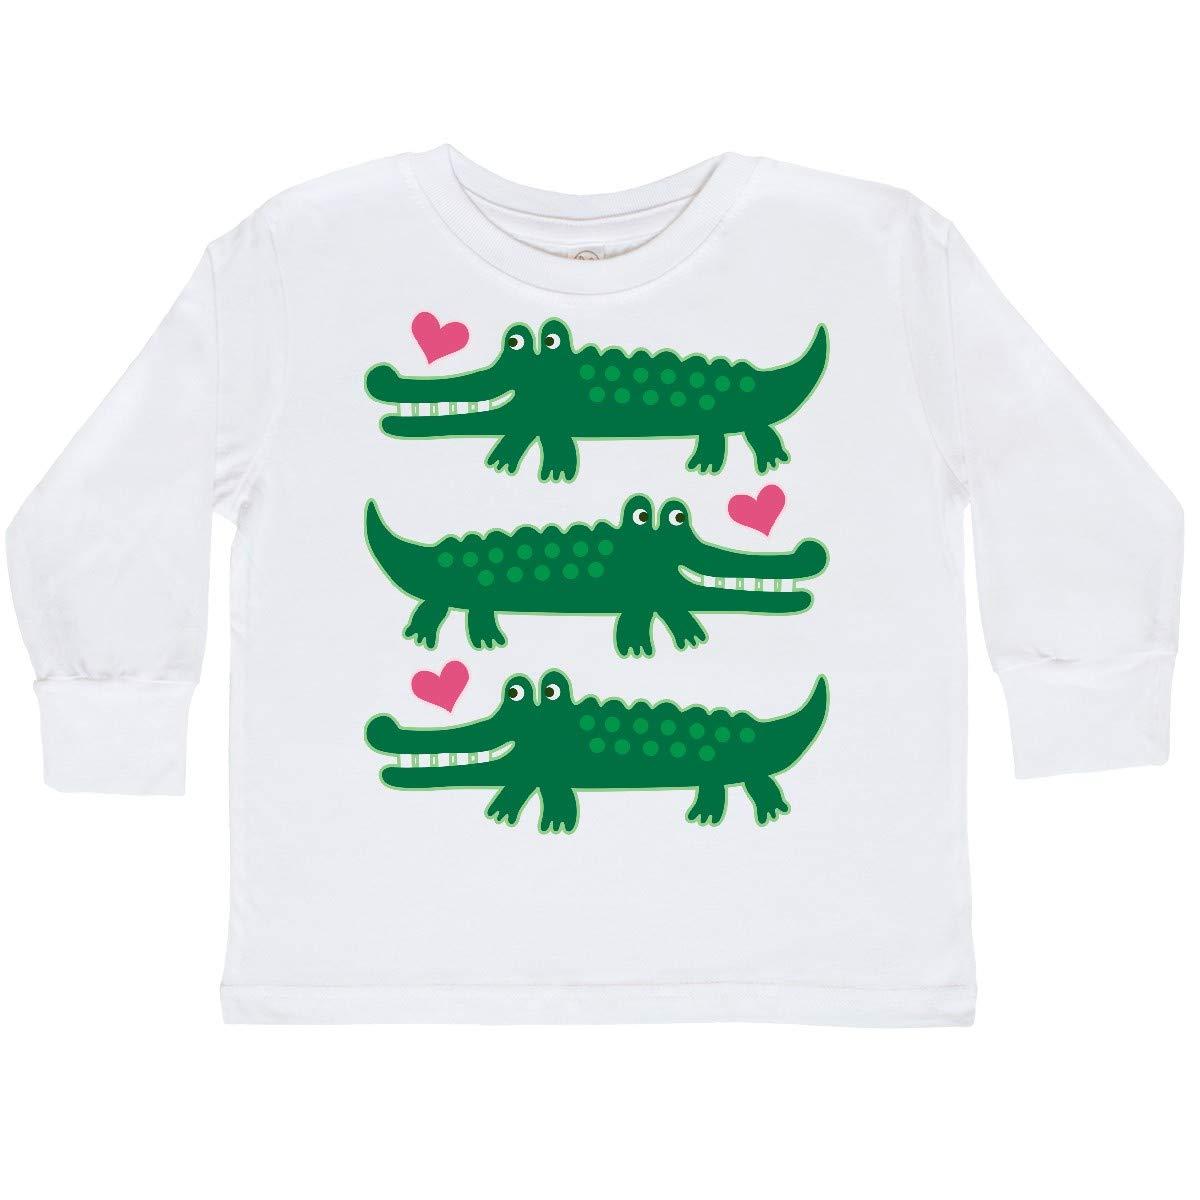 Alligator Crocodile Reptile Toddler Long Sleeve T-Shirt 2e1b8 inktastic